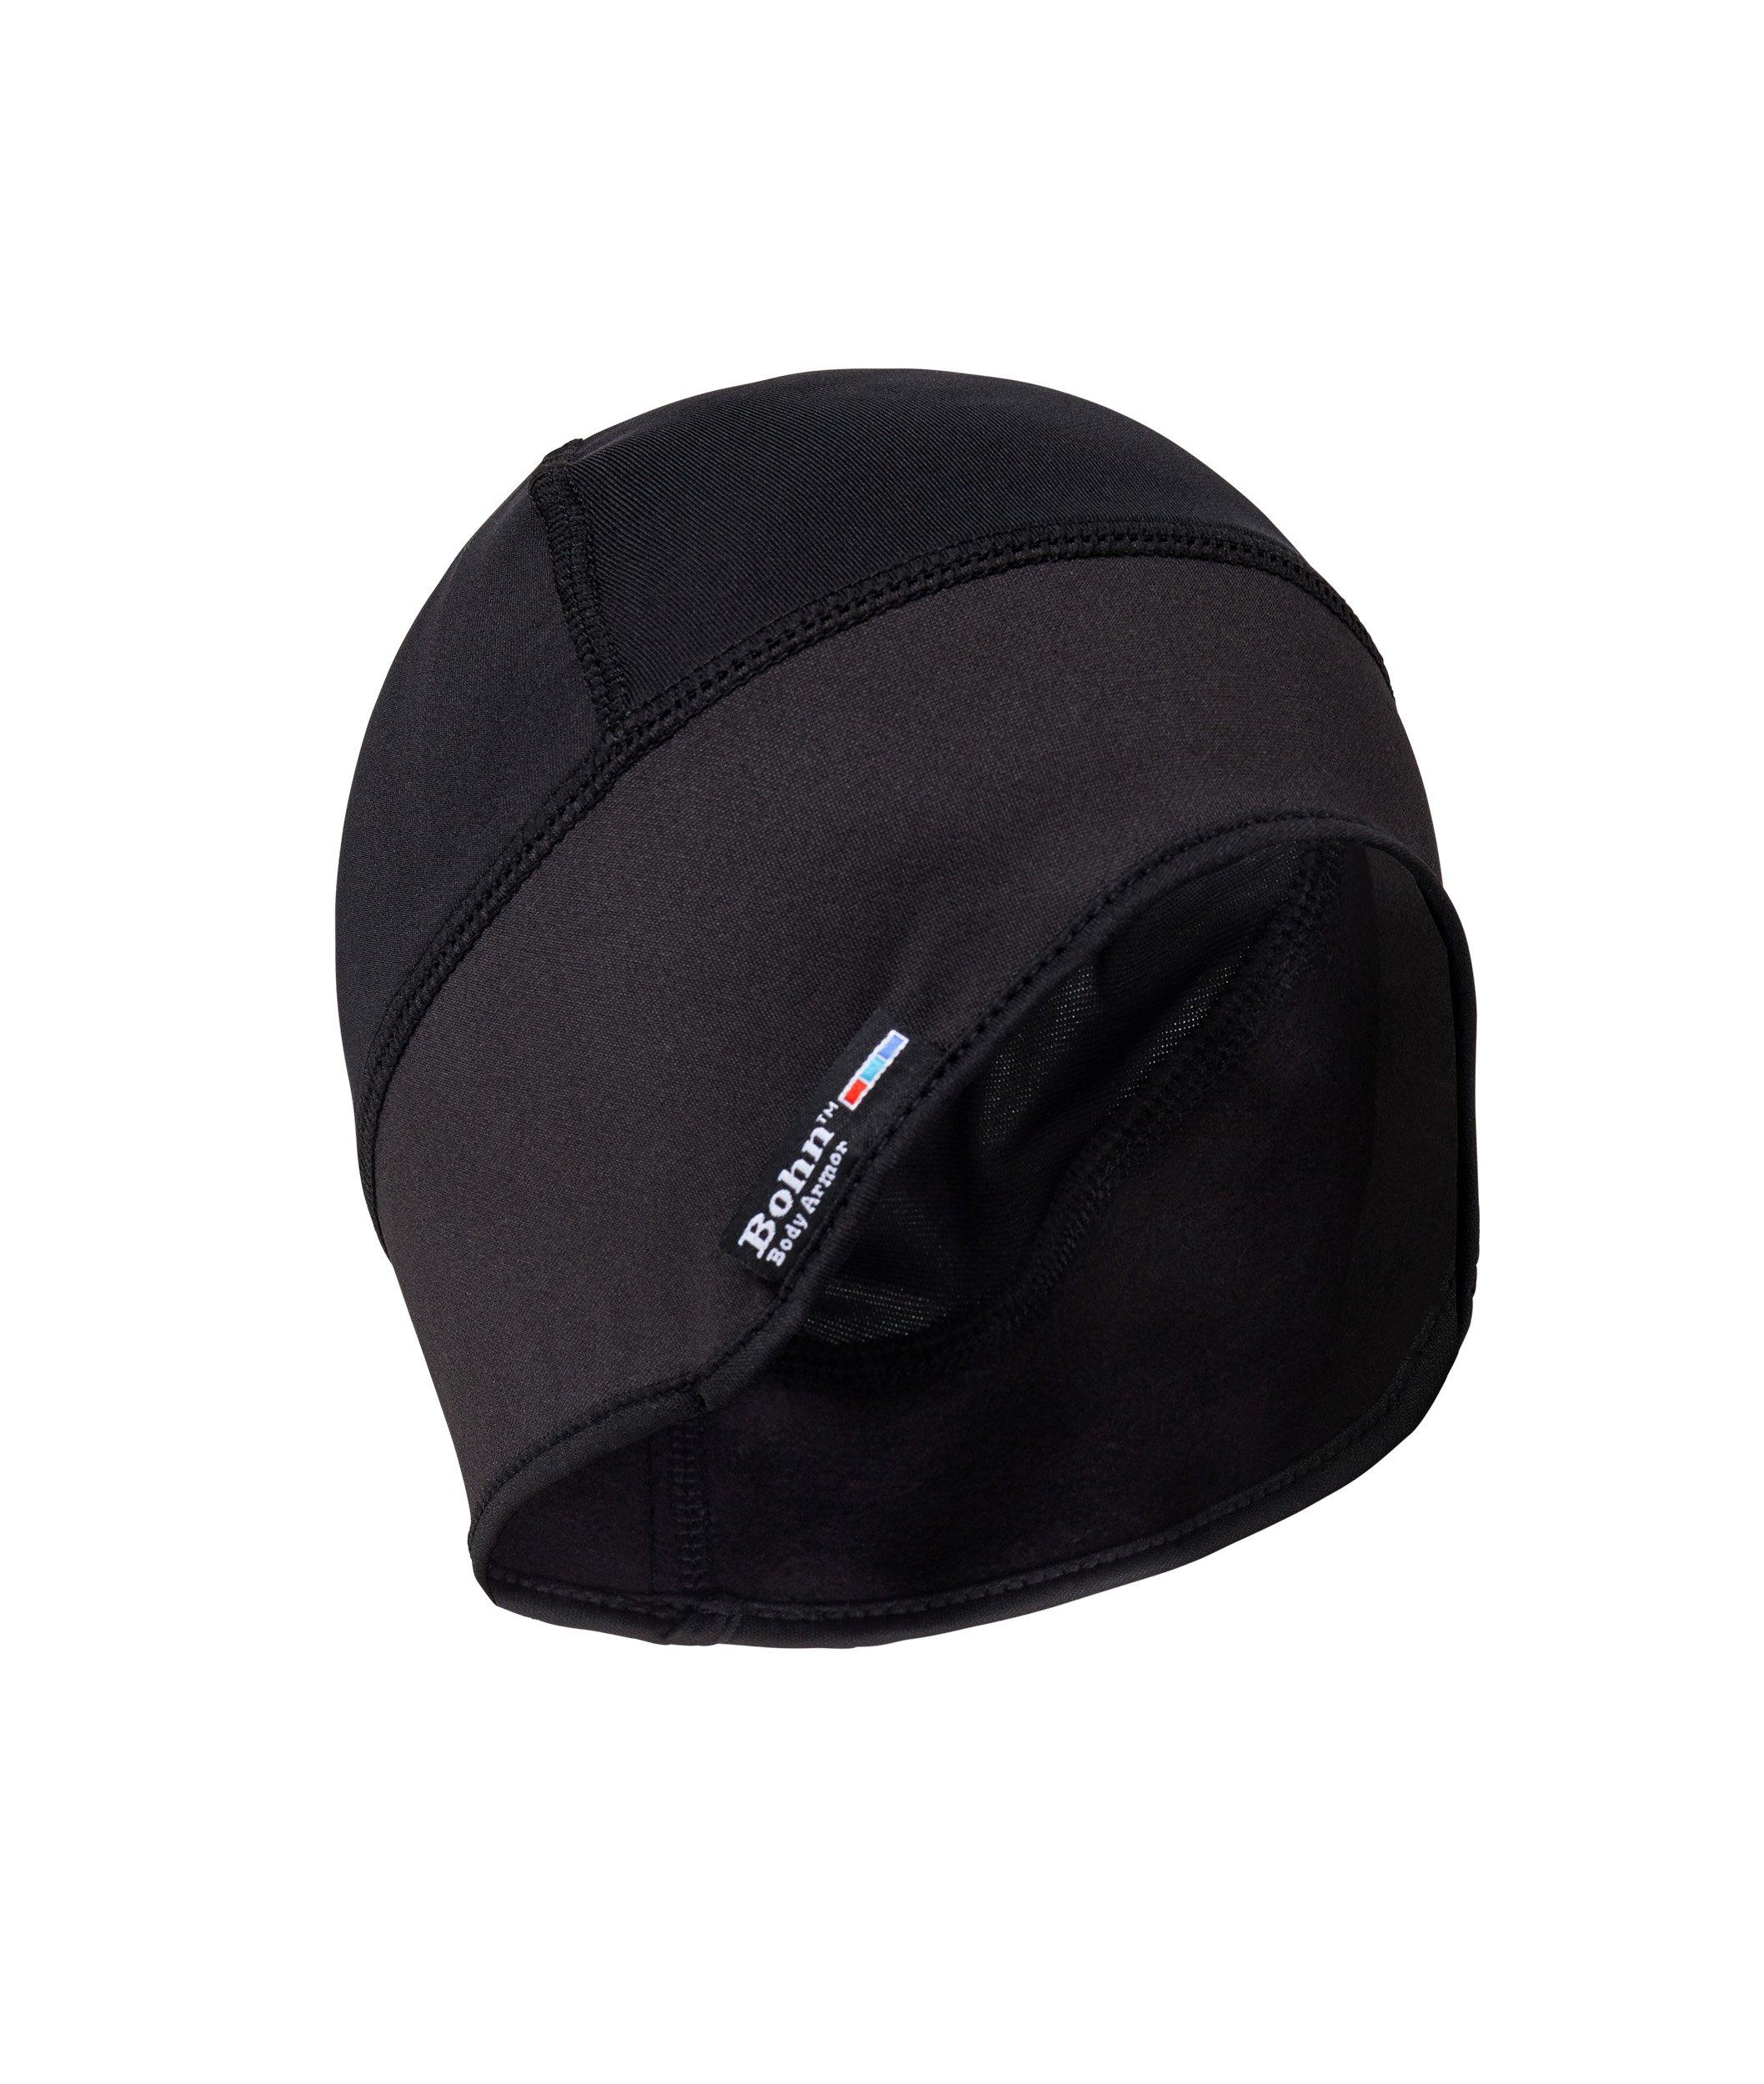 Bohn Skull Cap / Helmet Liner